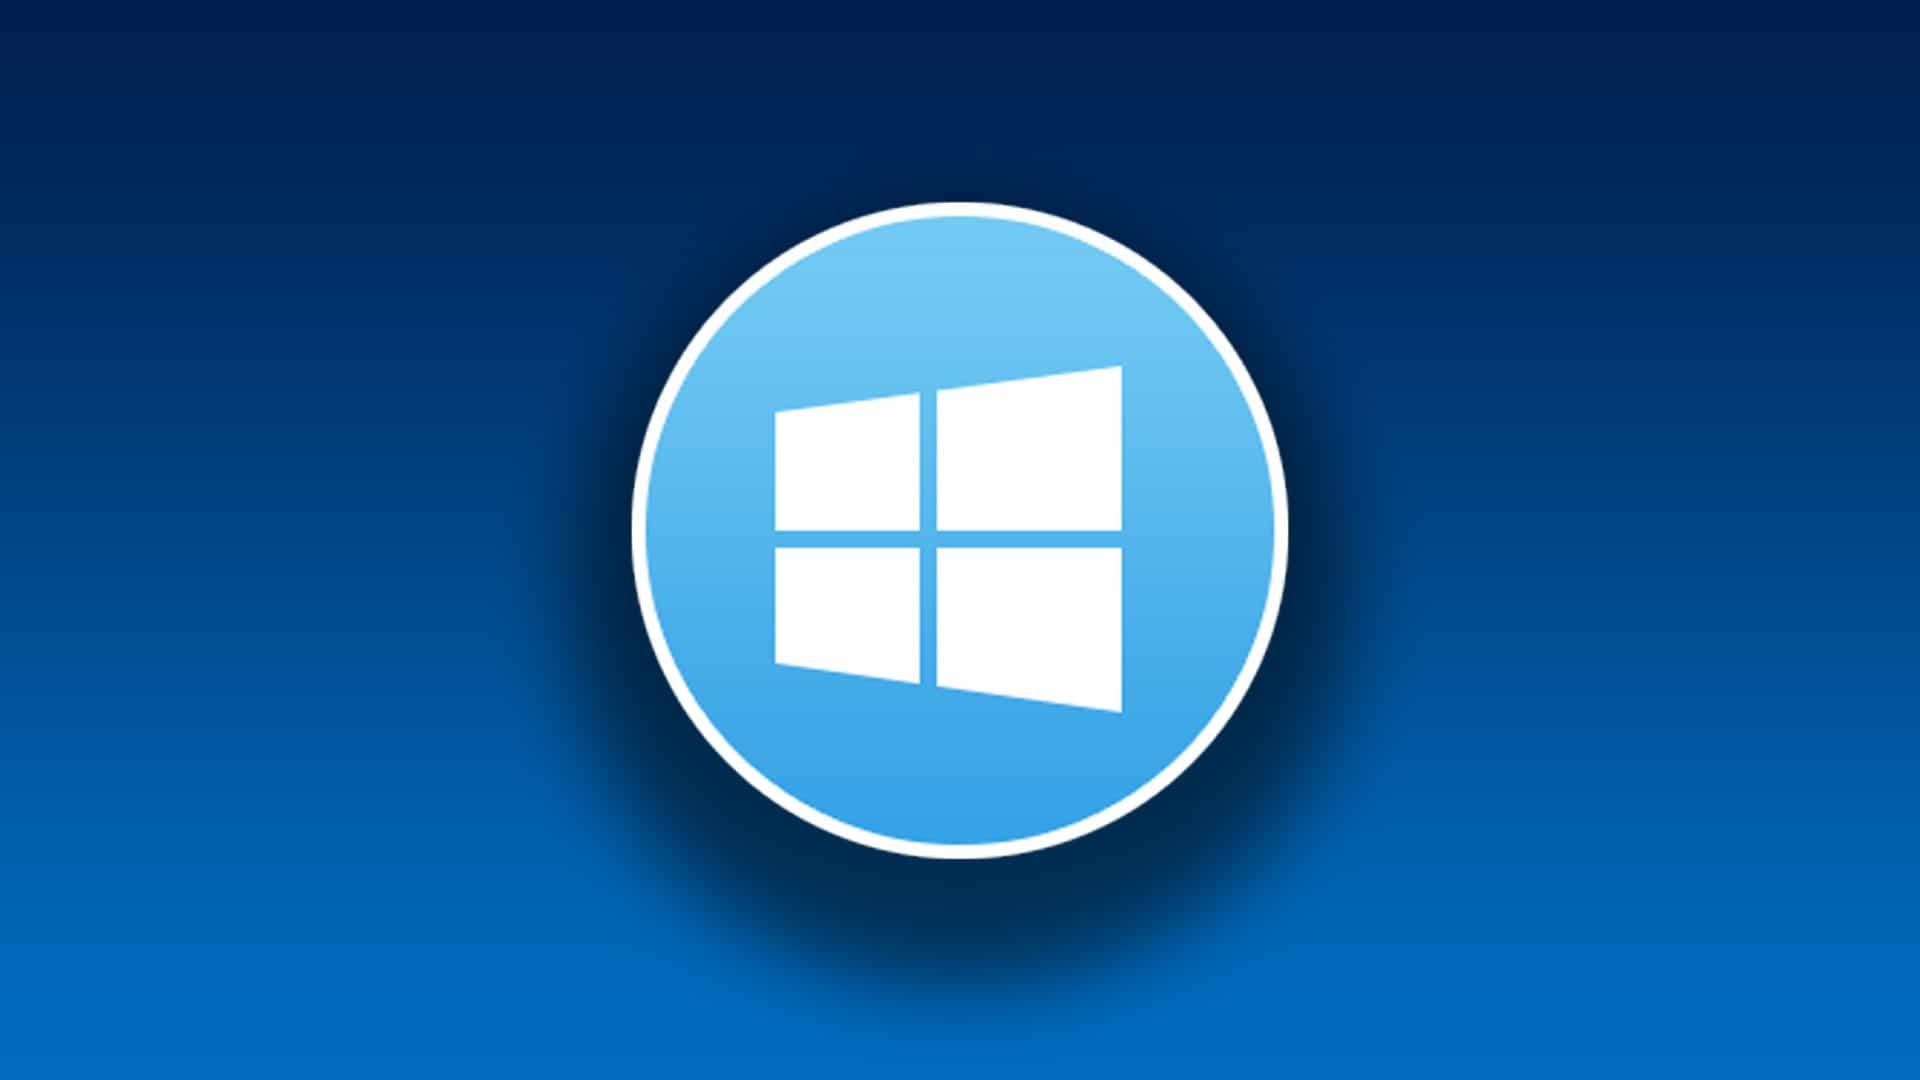 msvcr120.dll download windows 10